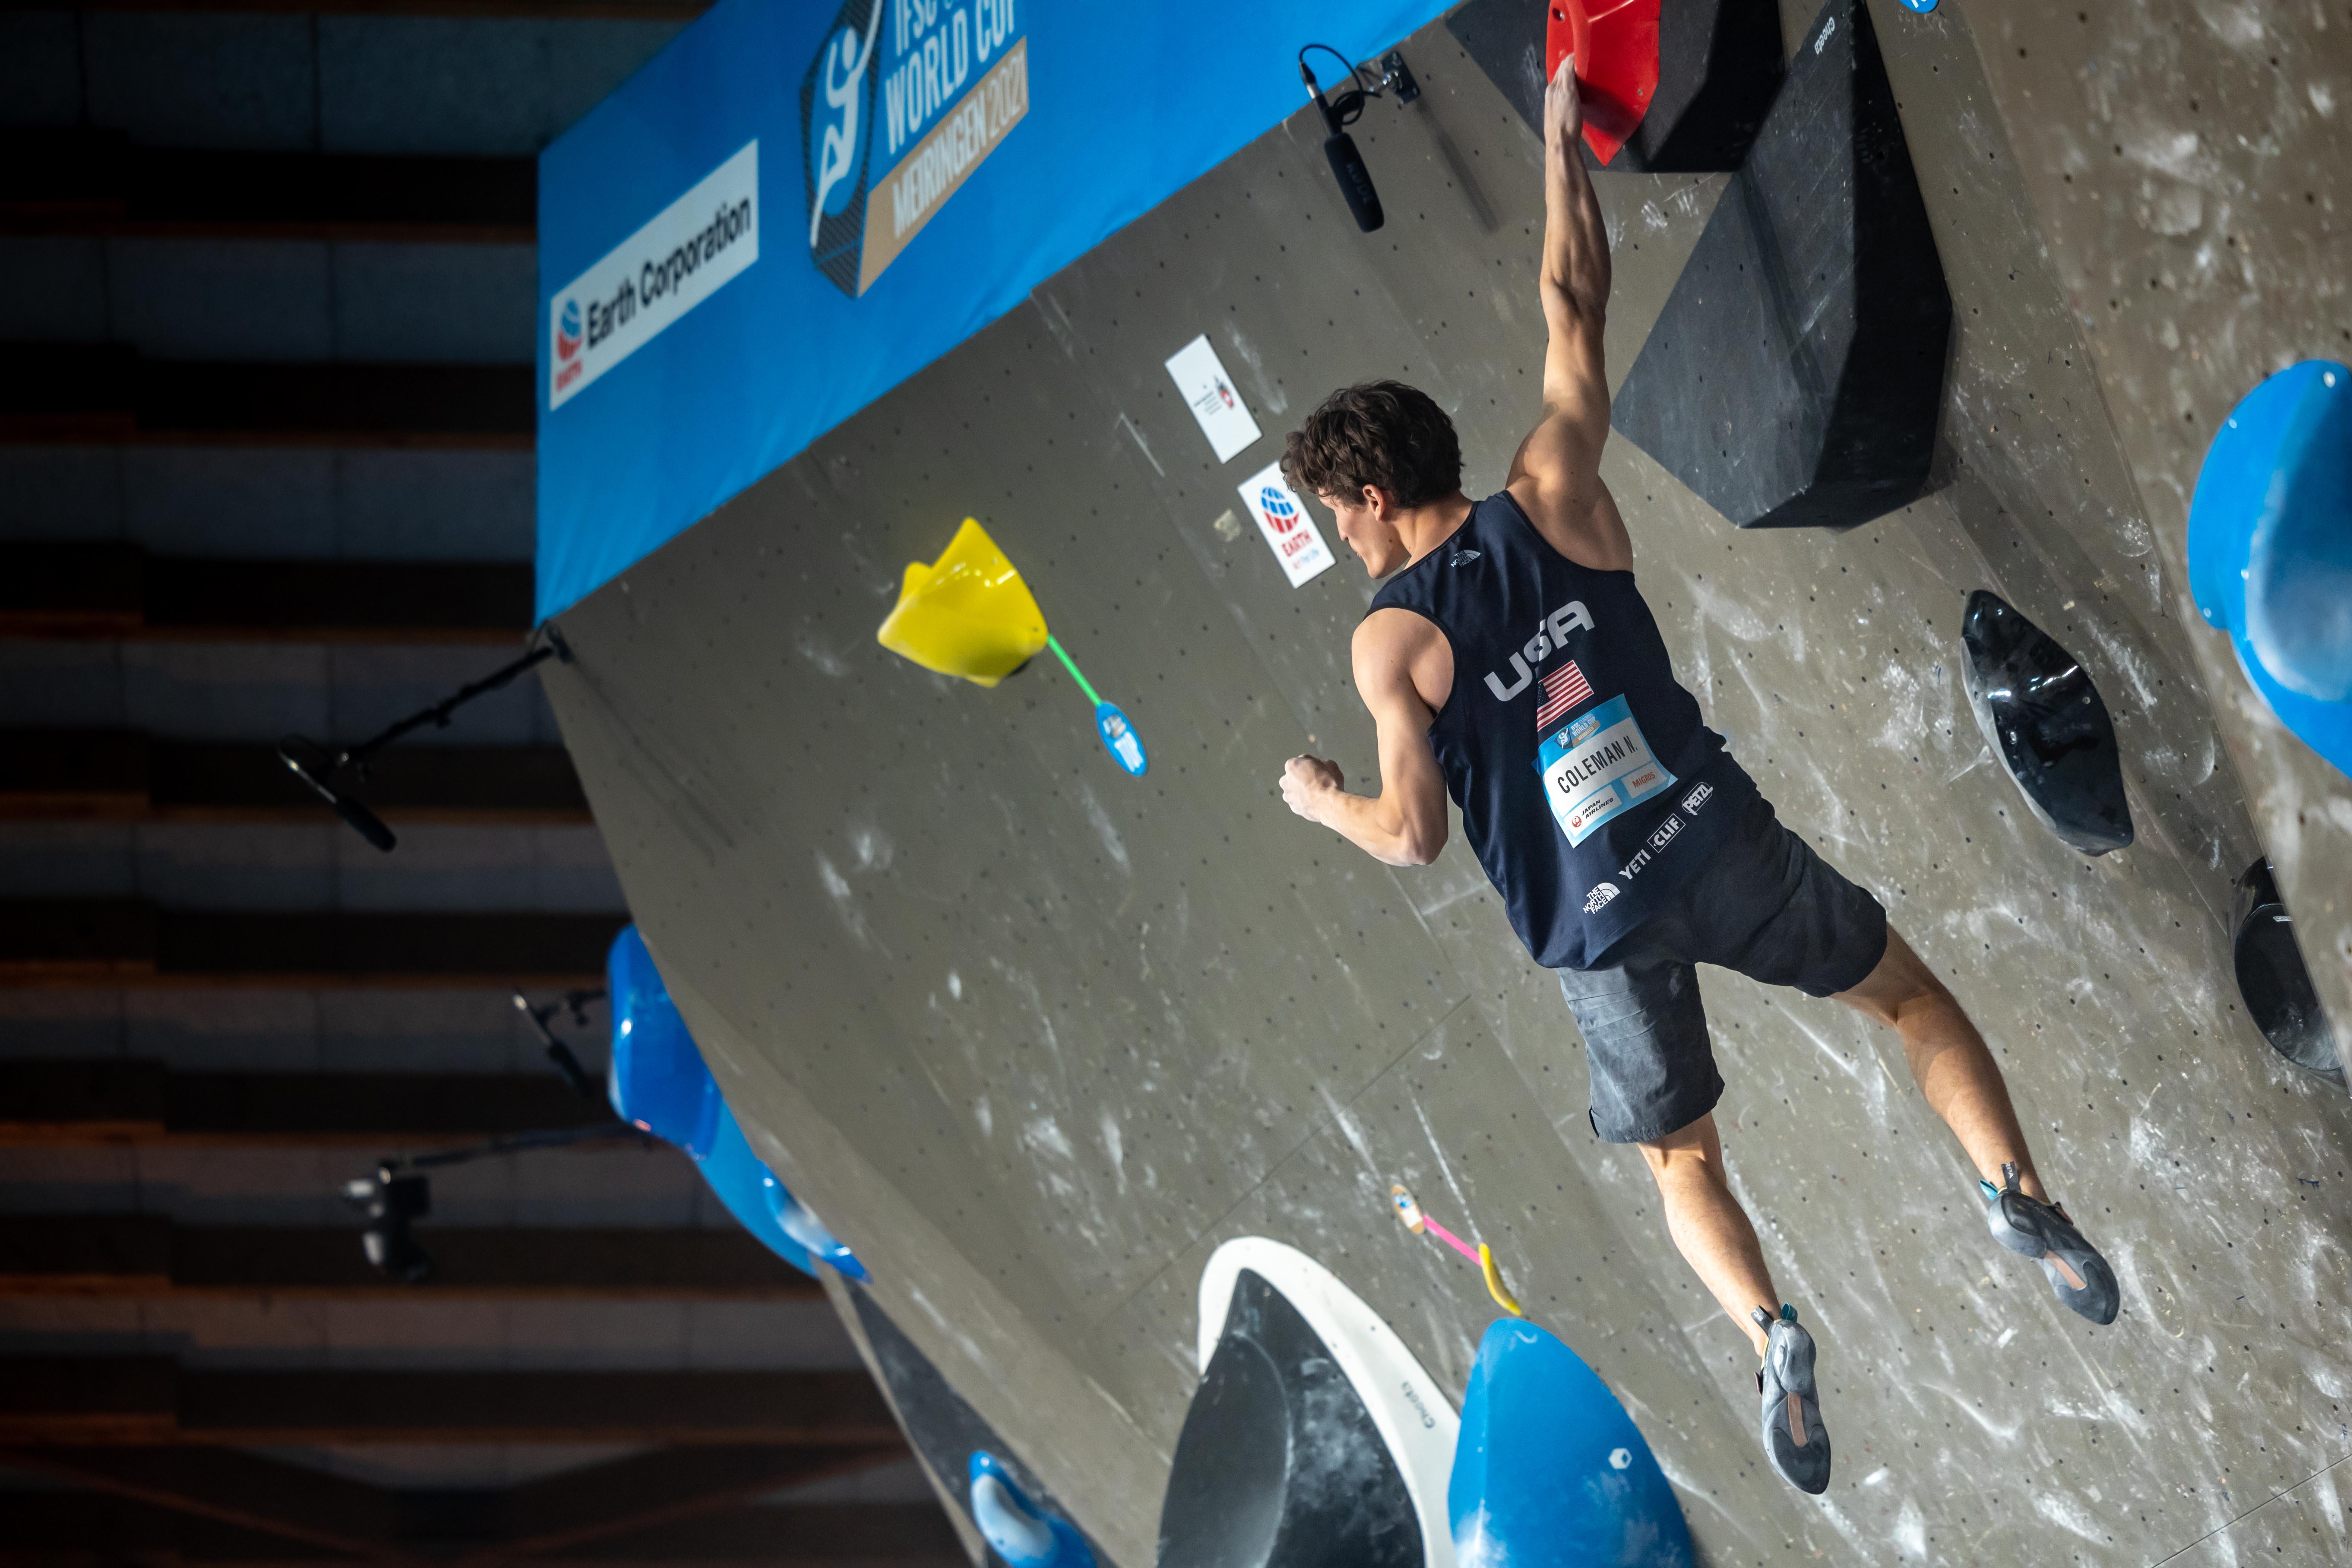 210420 IFSC News Salt Lake City Sport Climbing Tickets Now On Sale